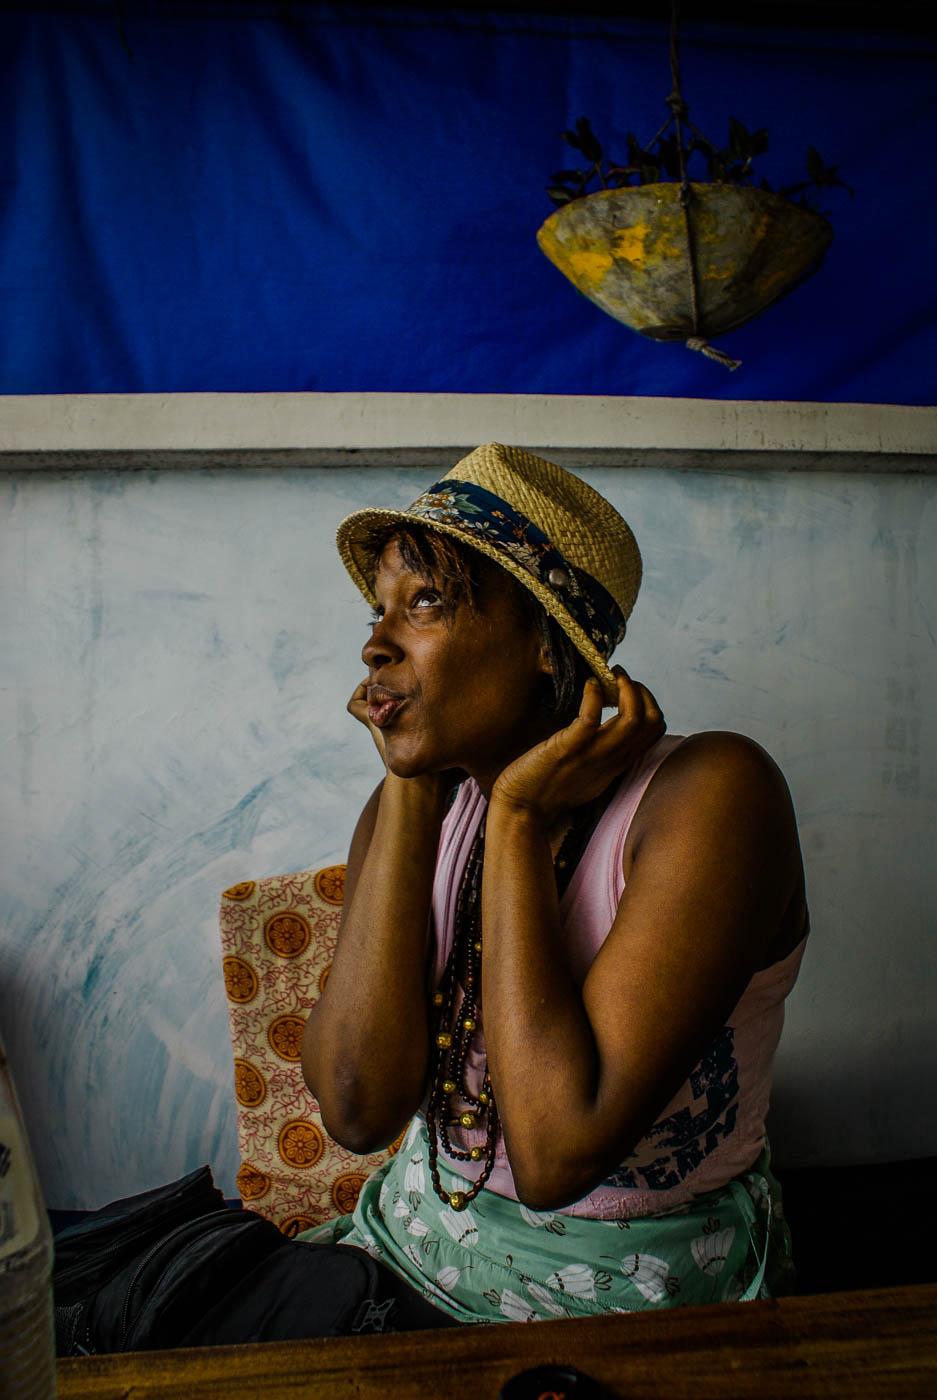 Julianna Barnaby in Zanzibar - Tanzania and Zanzibar - an exotic adventure. Beaches I Stone Town I Africa Travel I Dar Es Salaam #traveldestinations #traveltheworld #tanzania